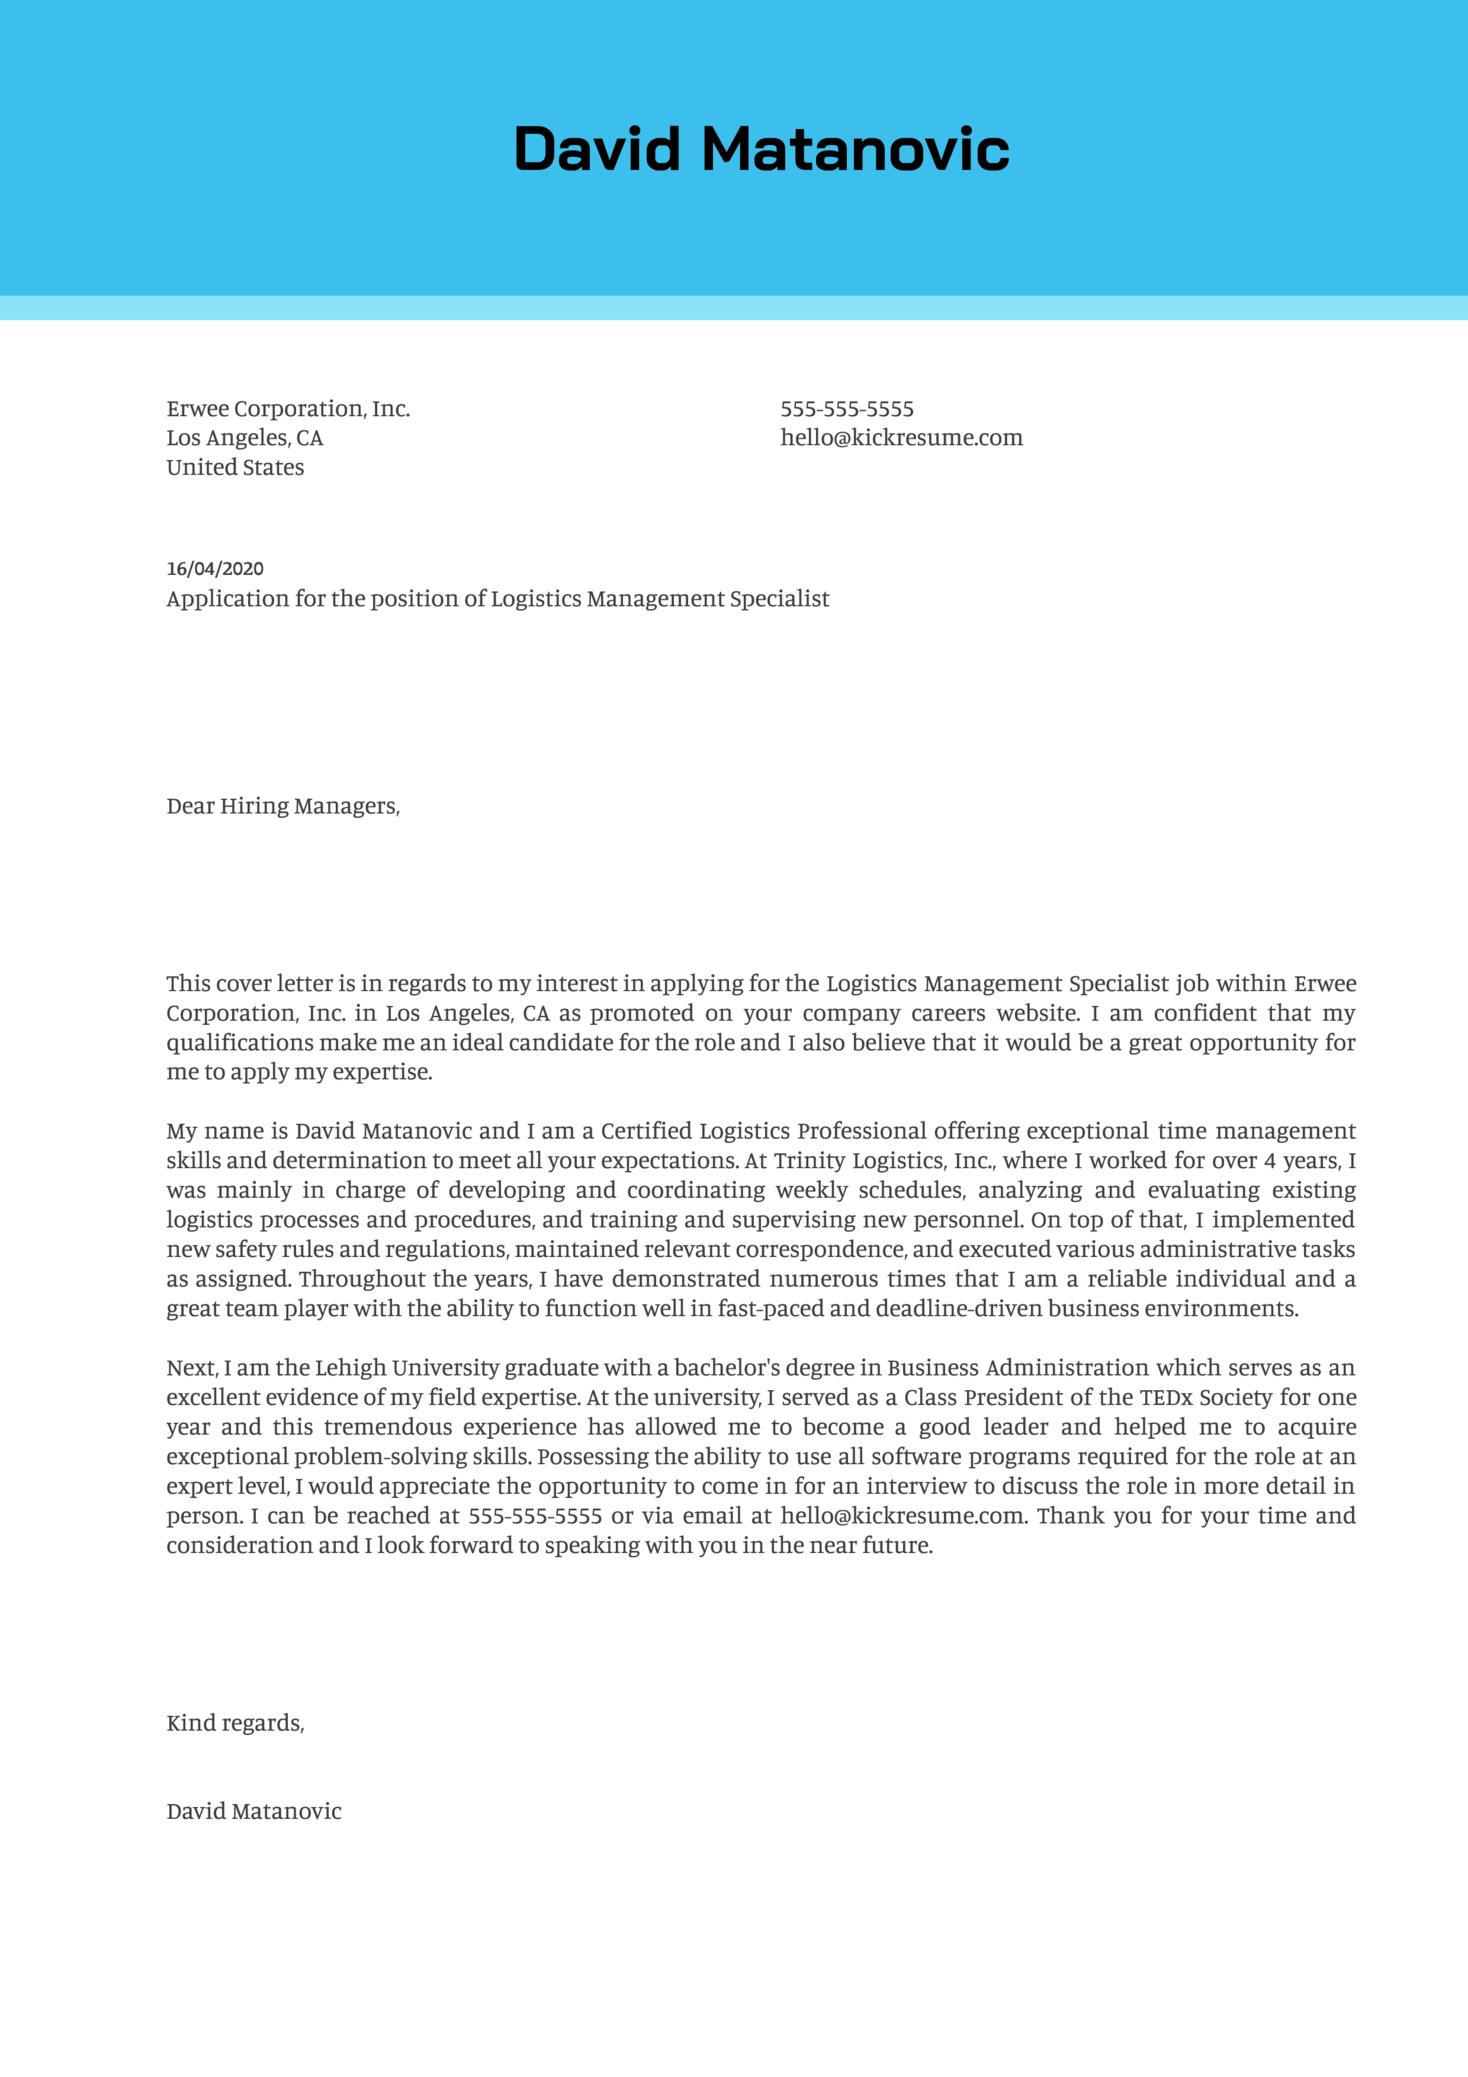 Logistics Management Specialist Cover Letter Sample